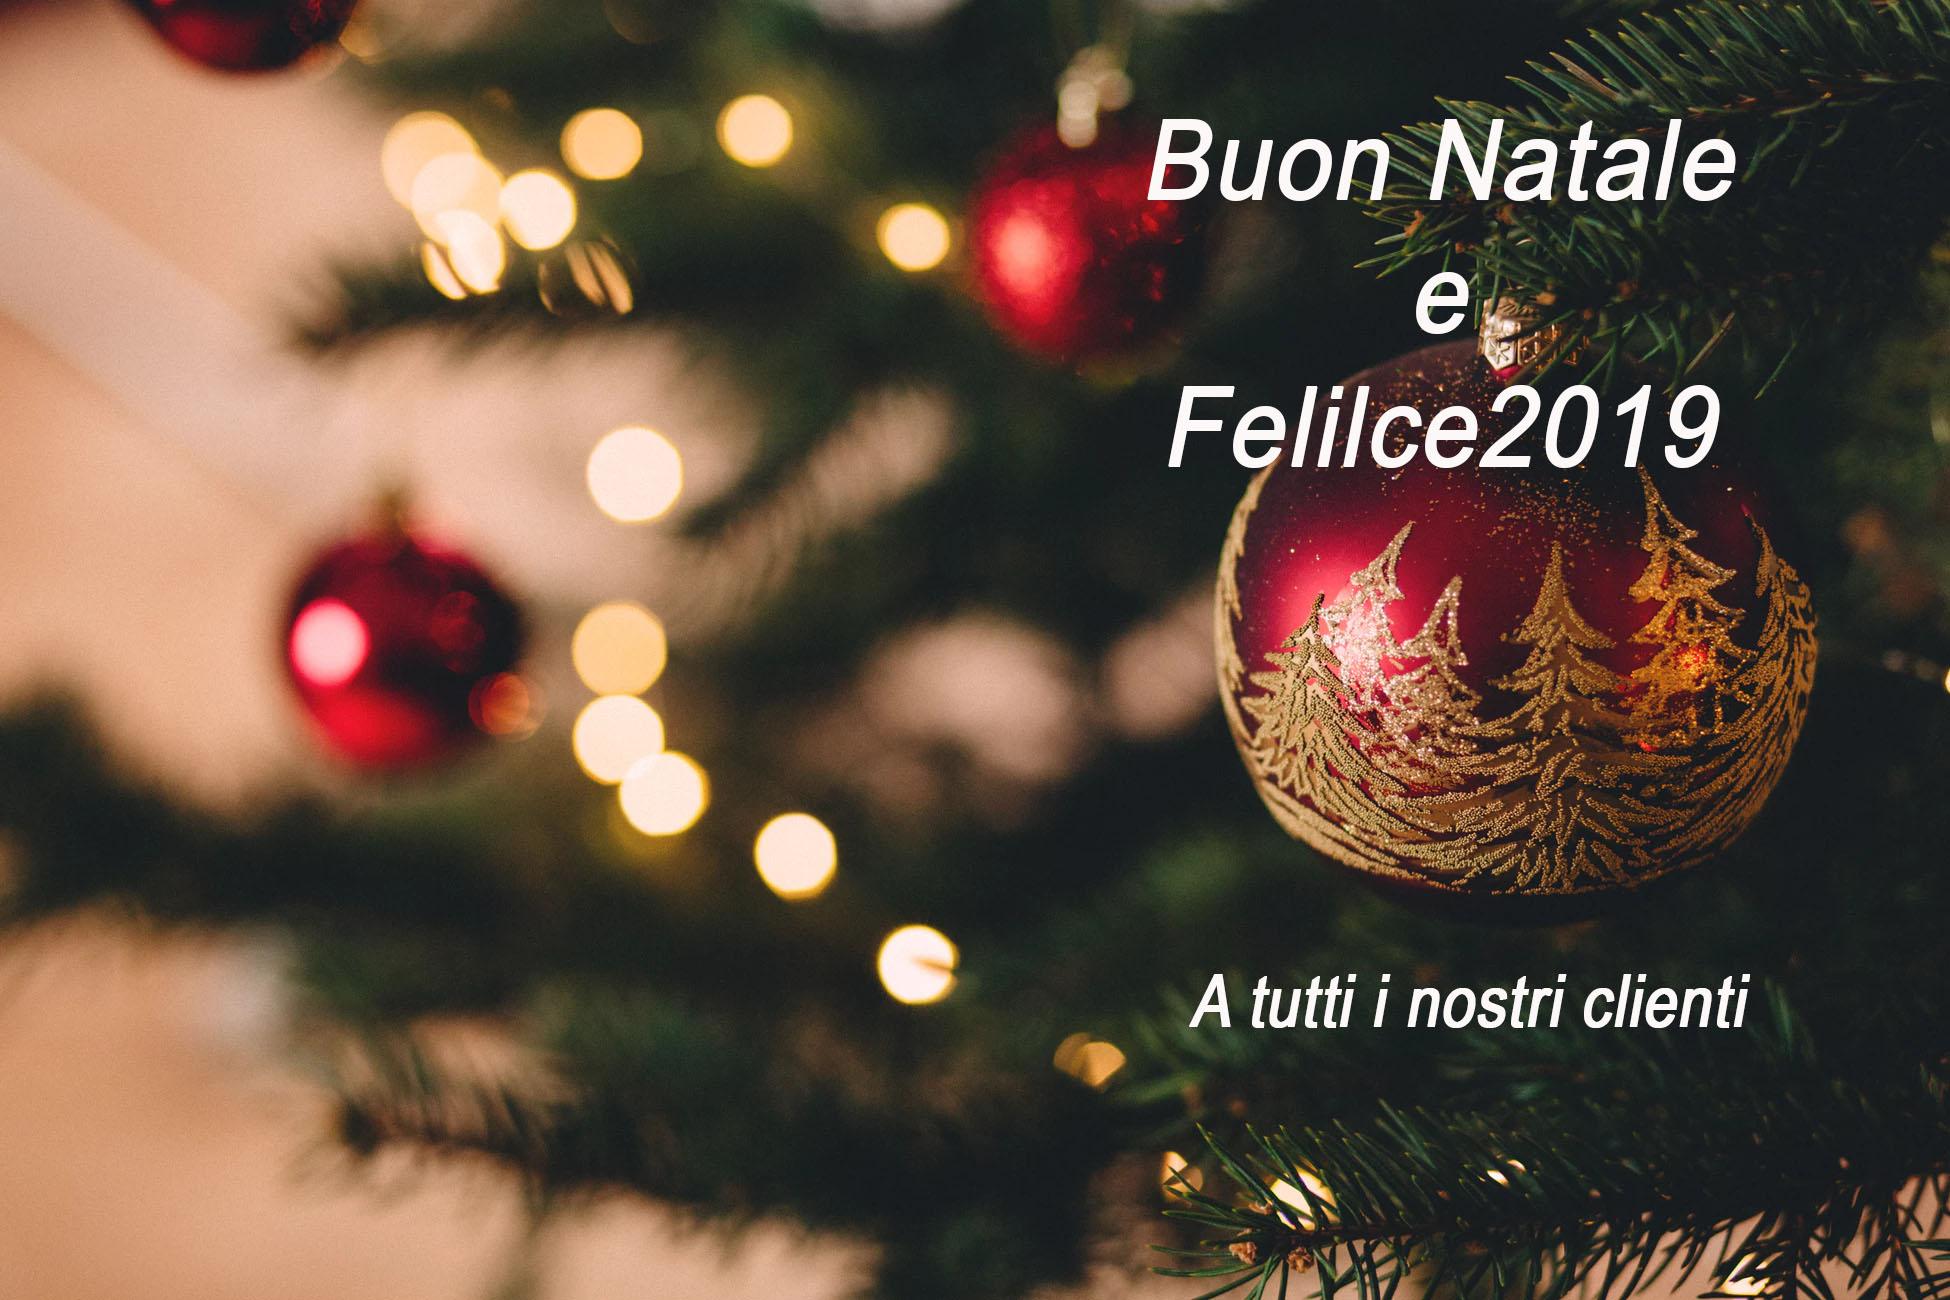 Buon Natale 2018